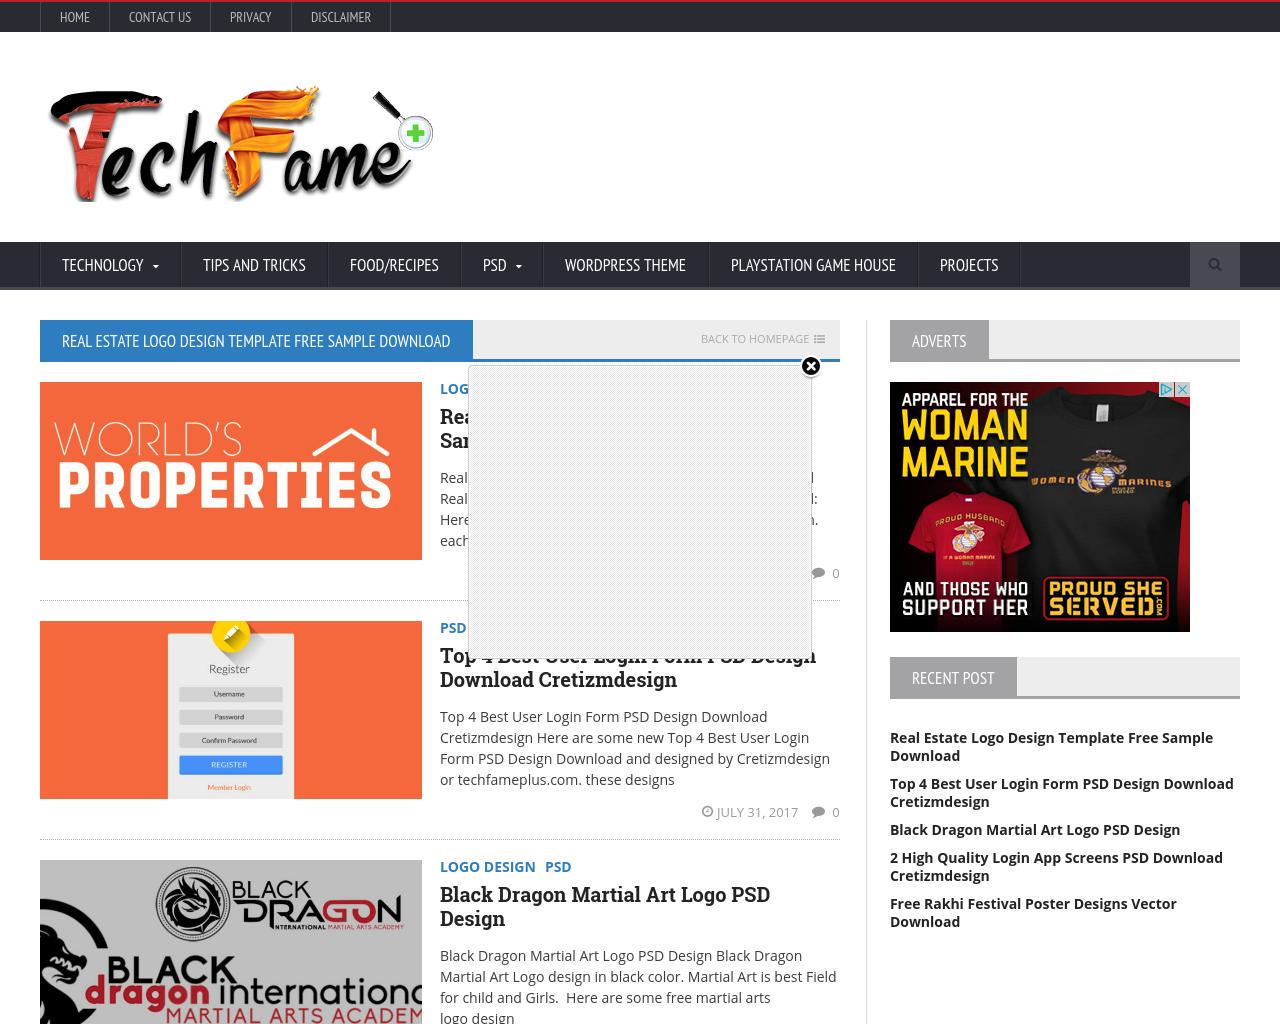 Tech-Fame-Advertising-Reviews-Pricing